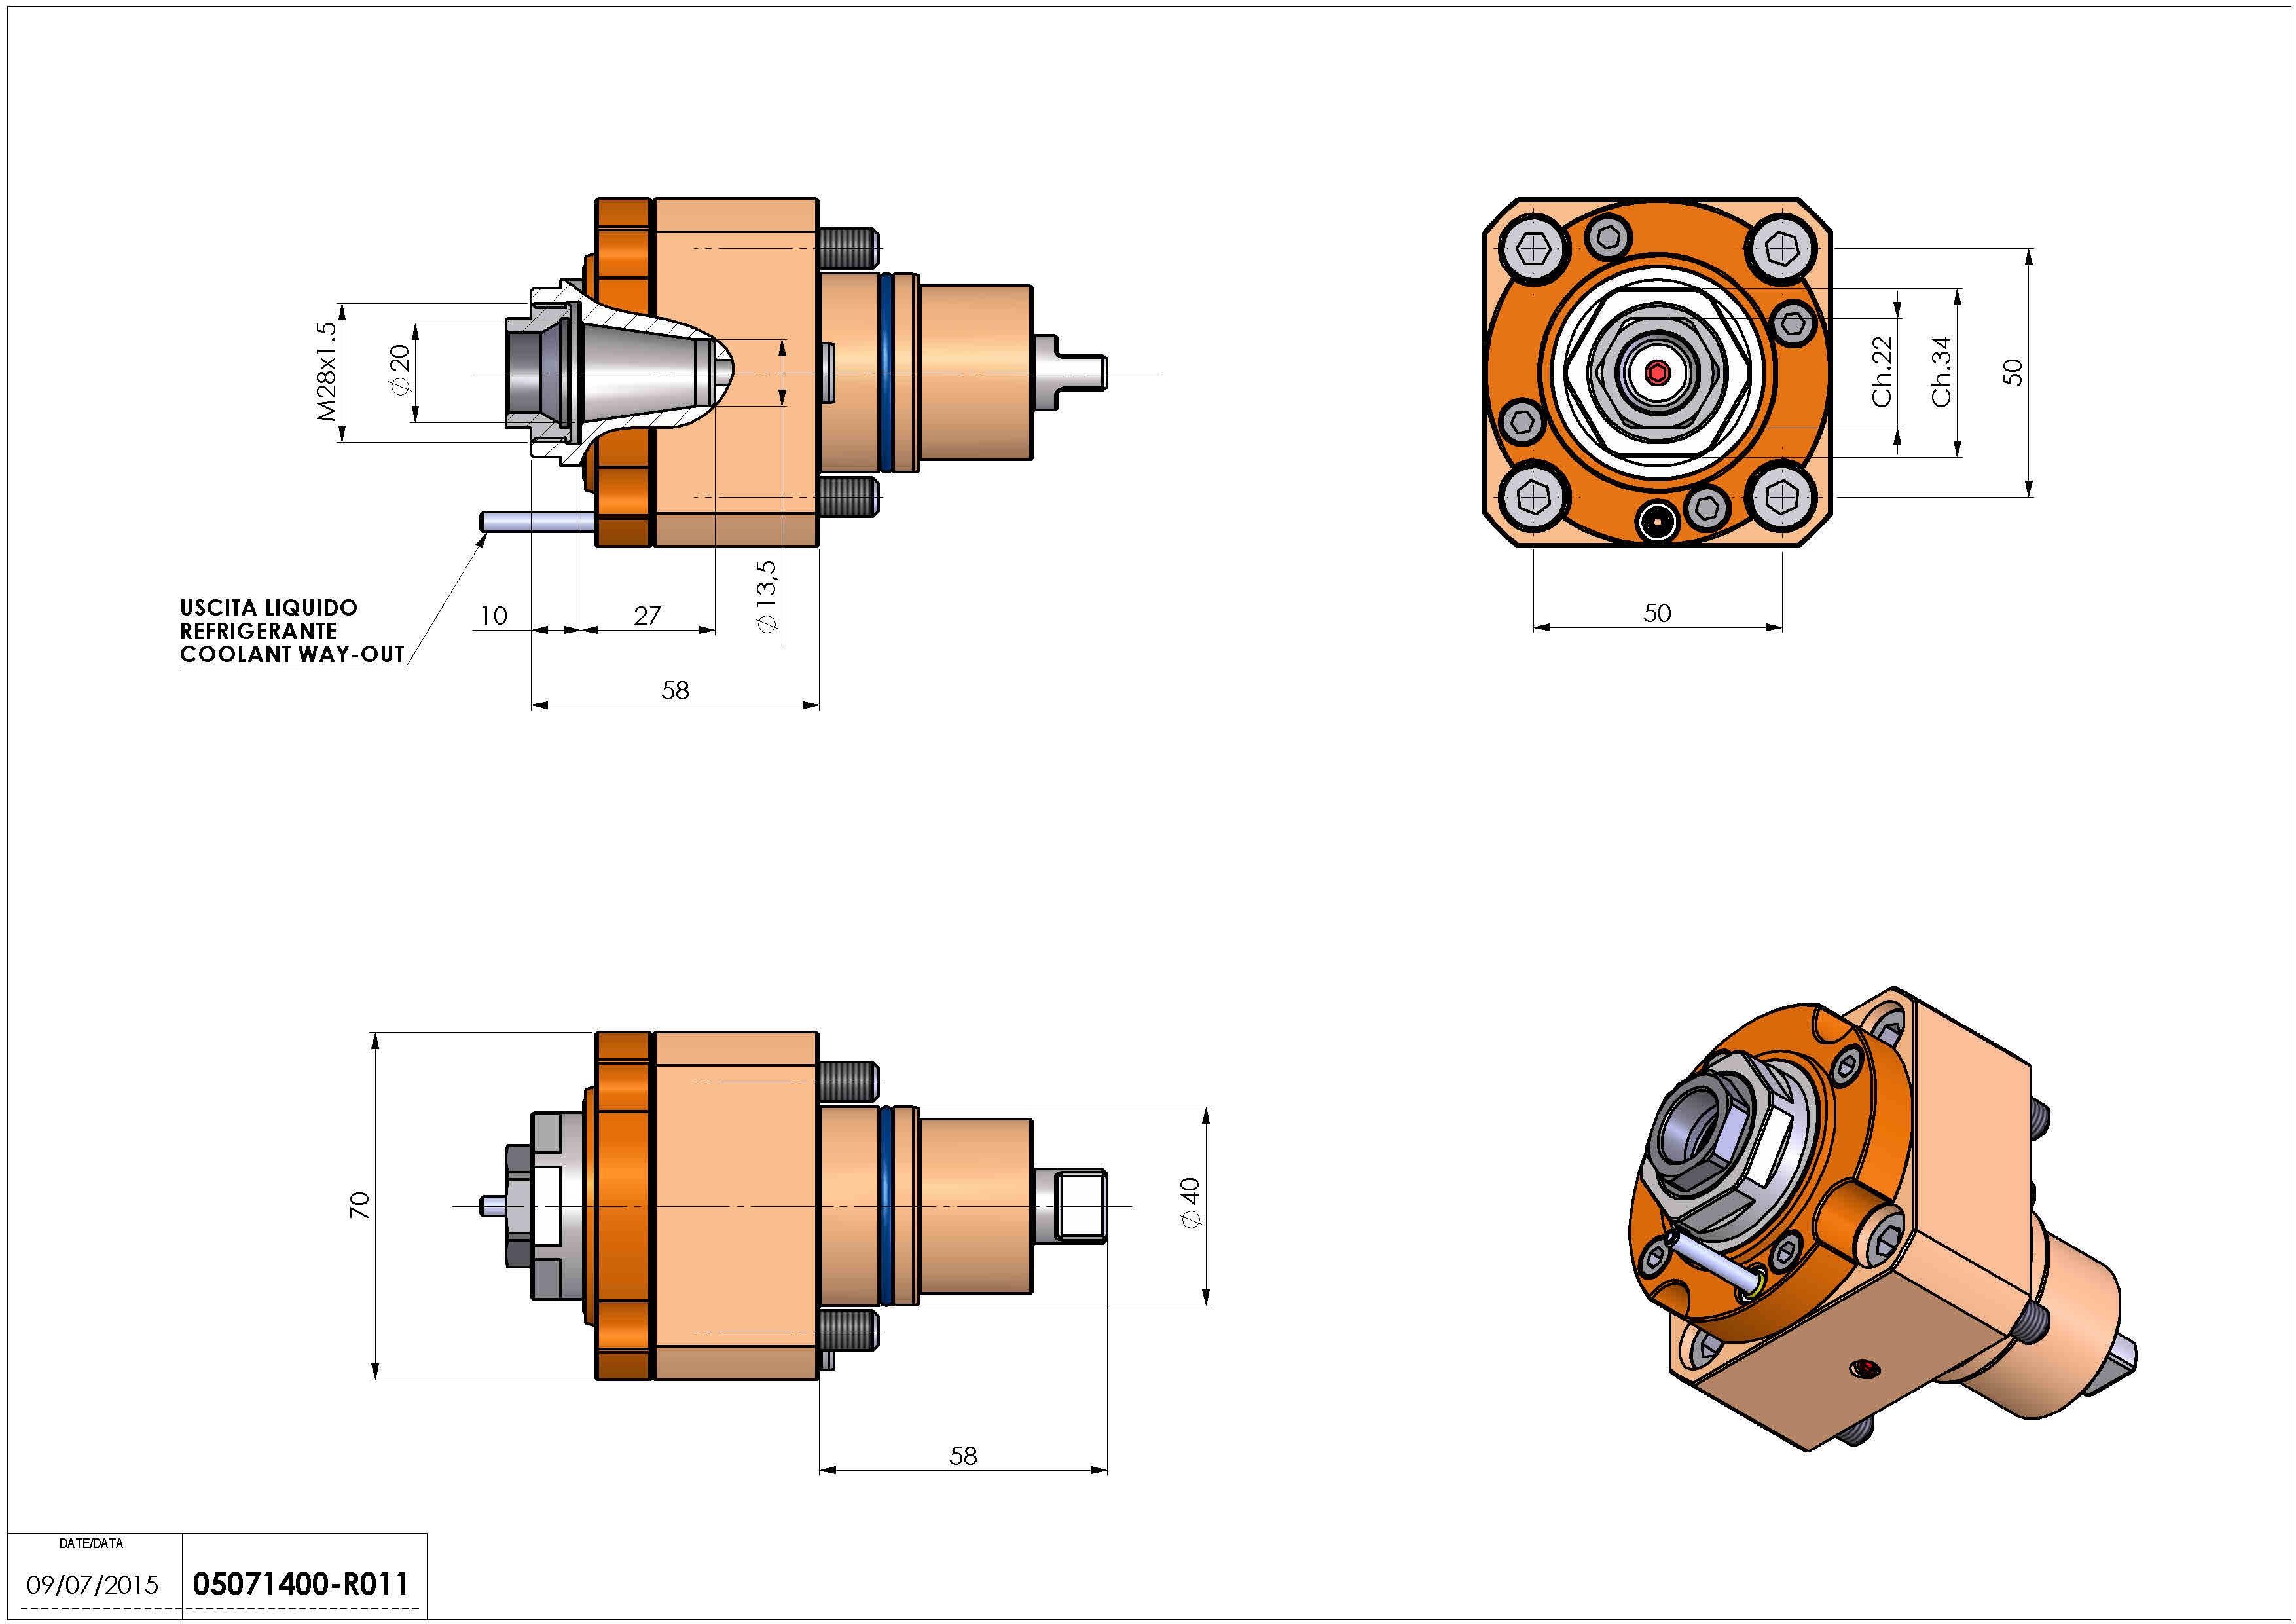 Technical image - LT-S D40 ER20F H58 BI.